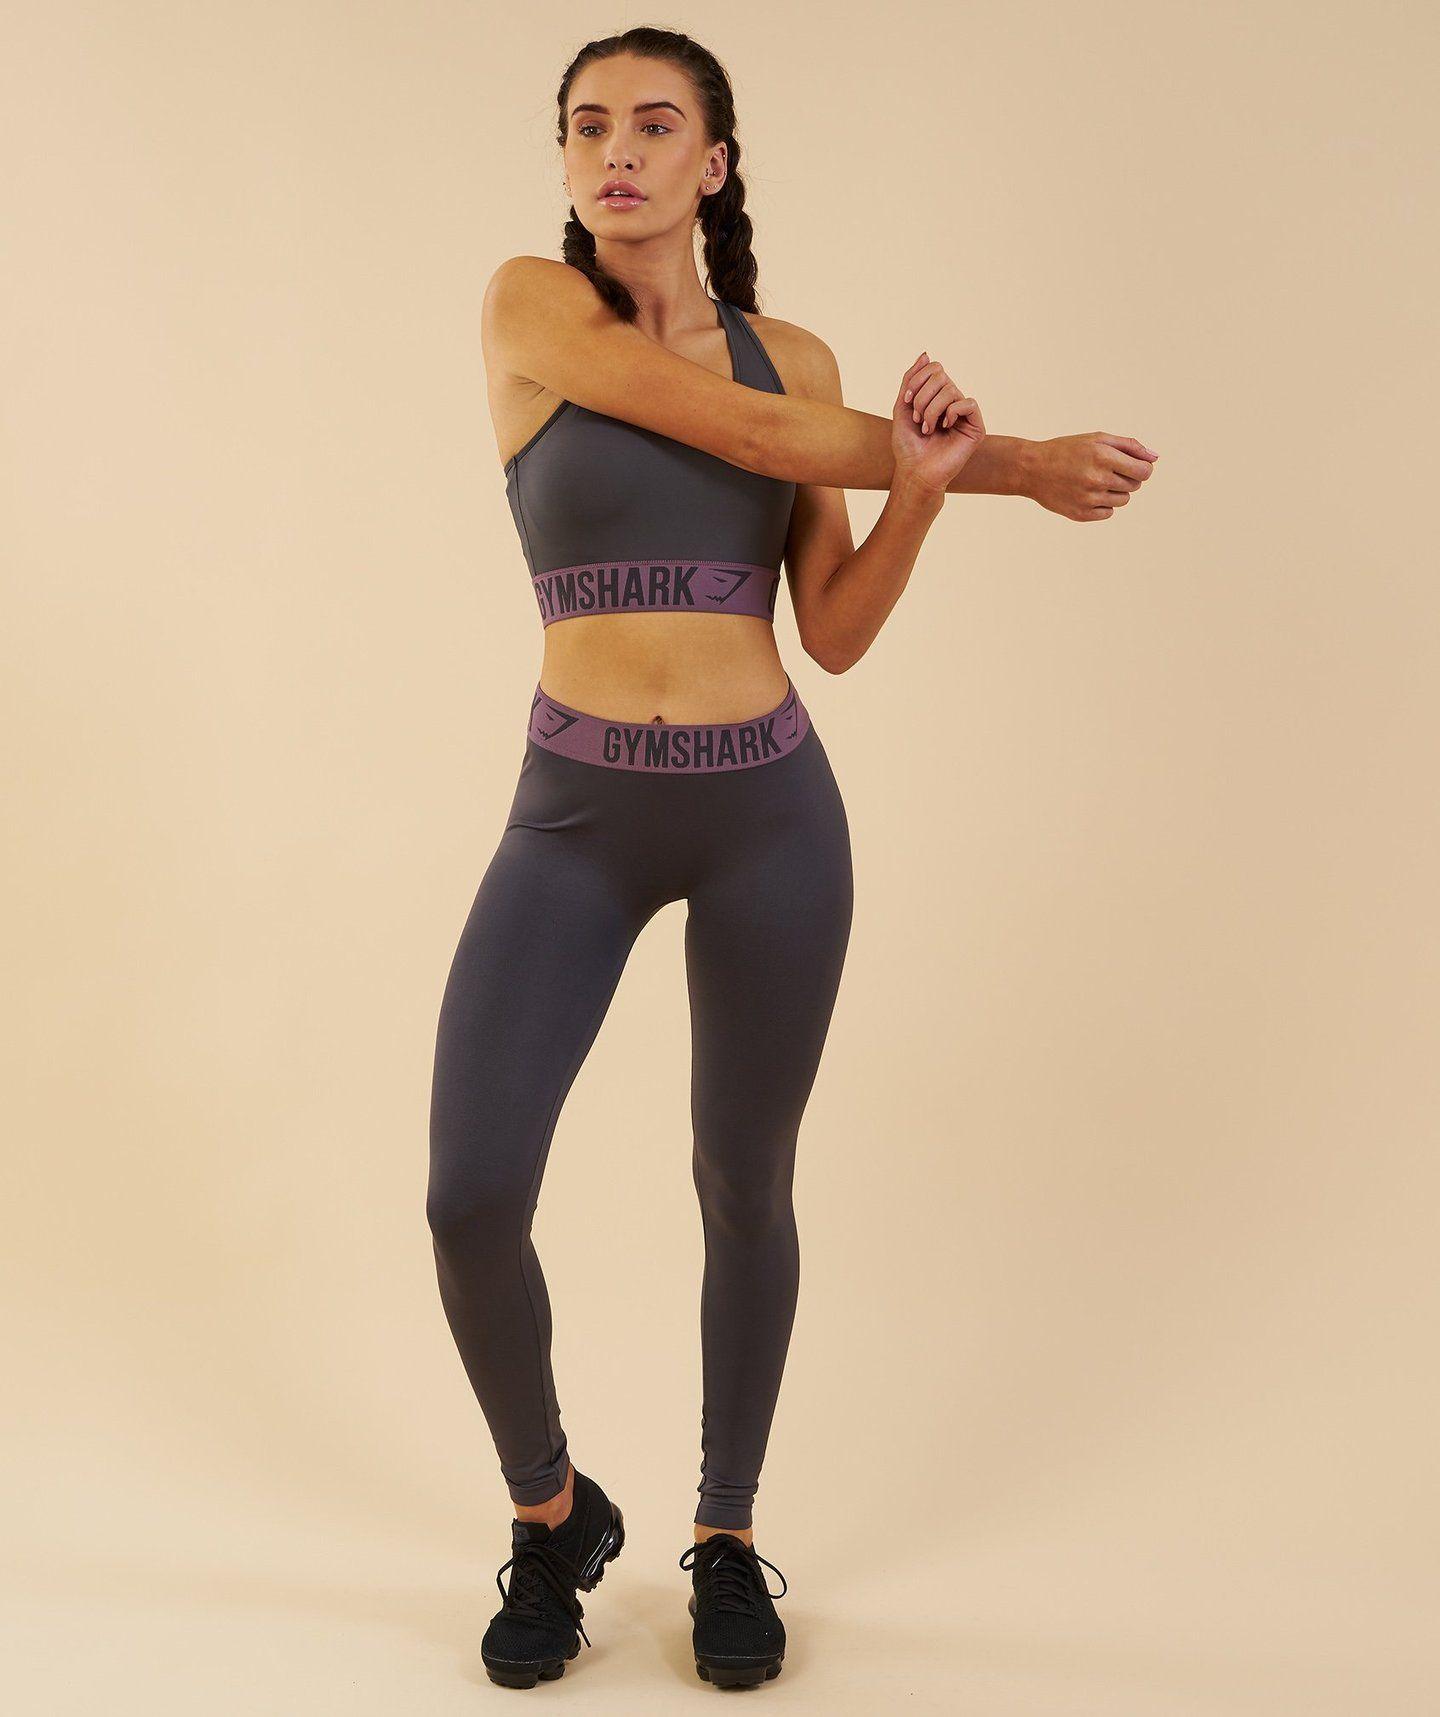 621414933f52d Gymshark Fit Leggings - Charcoal/Purple Wash   Homes